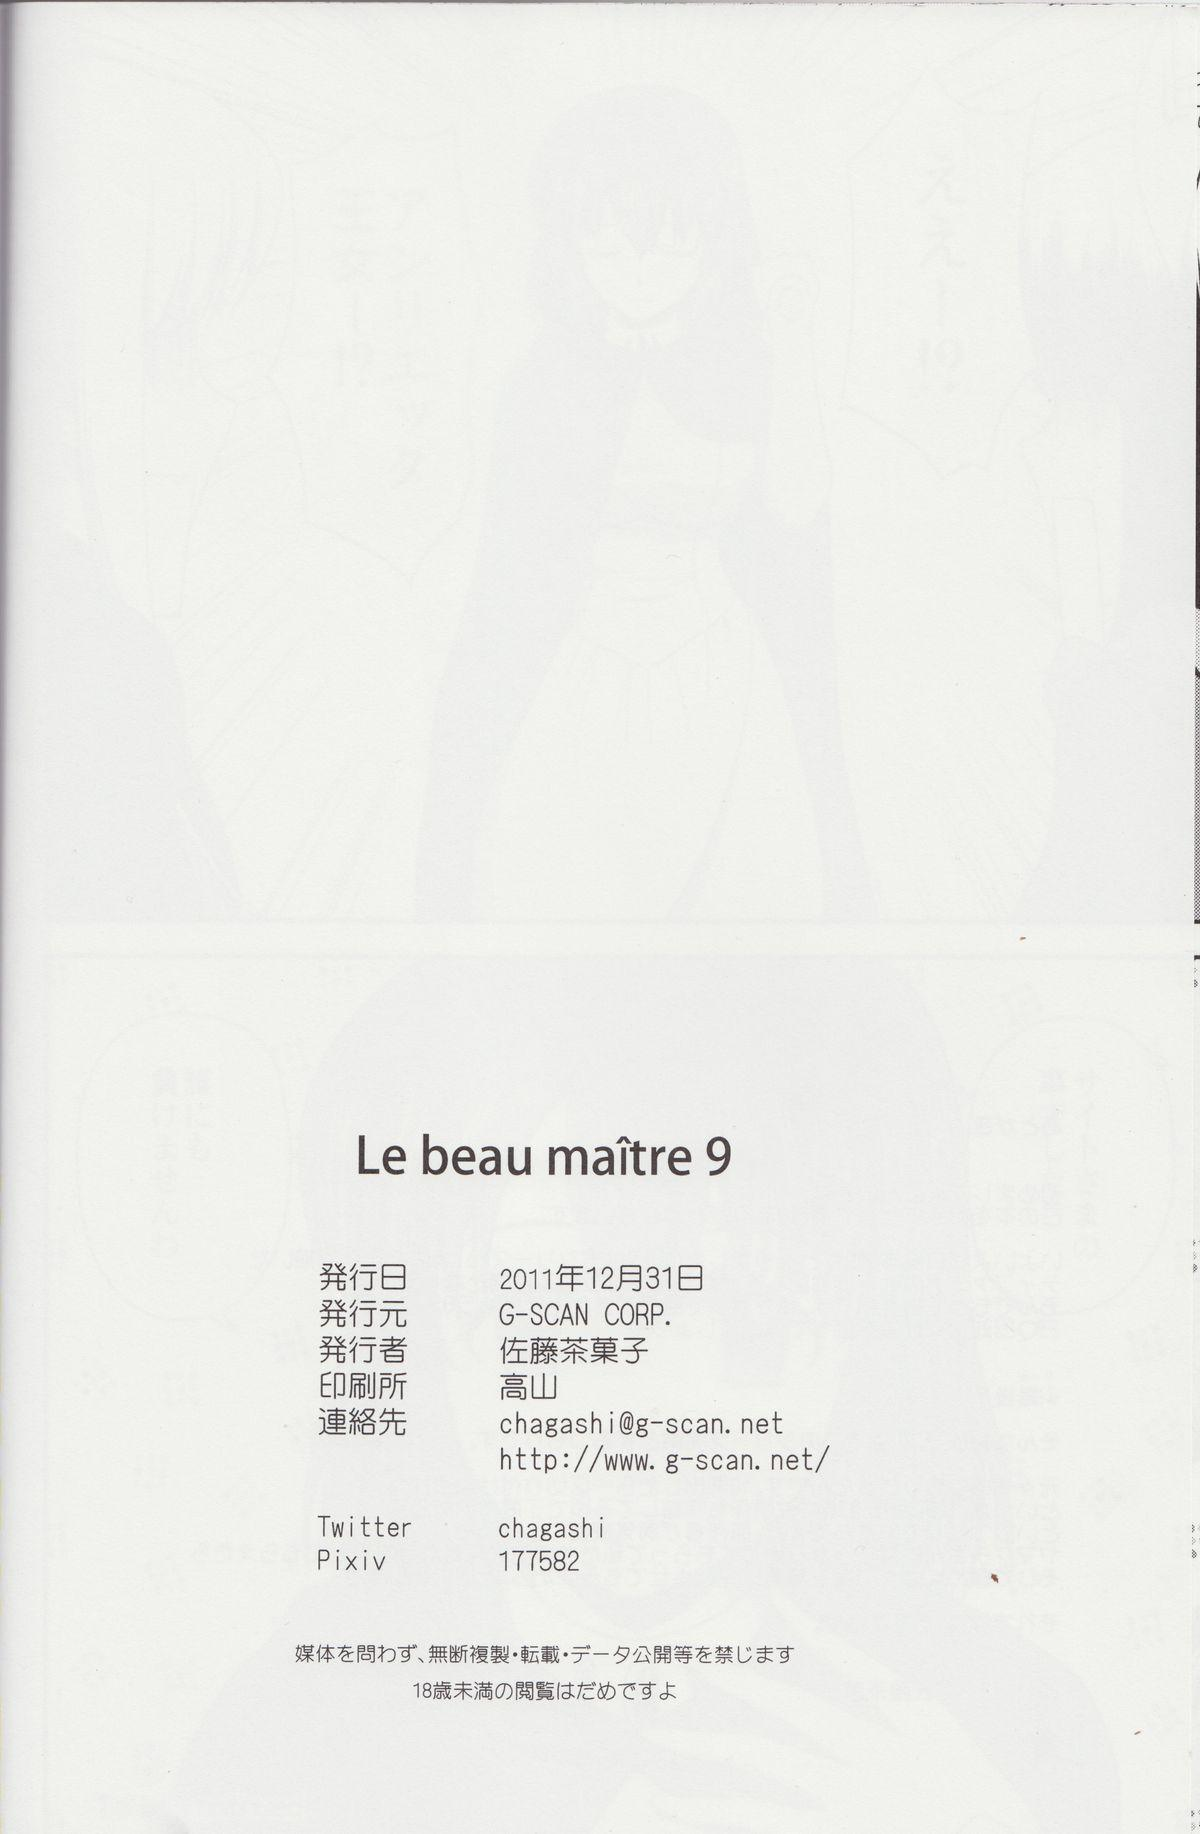 Le Beau Maitre 9 24